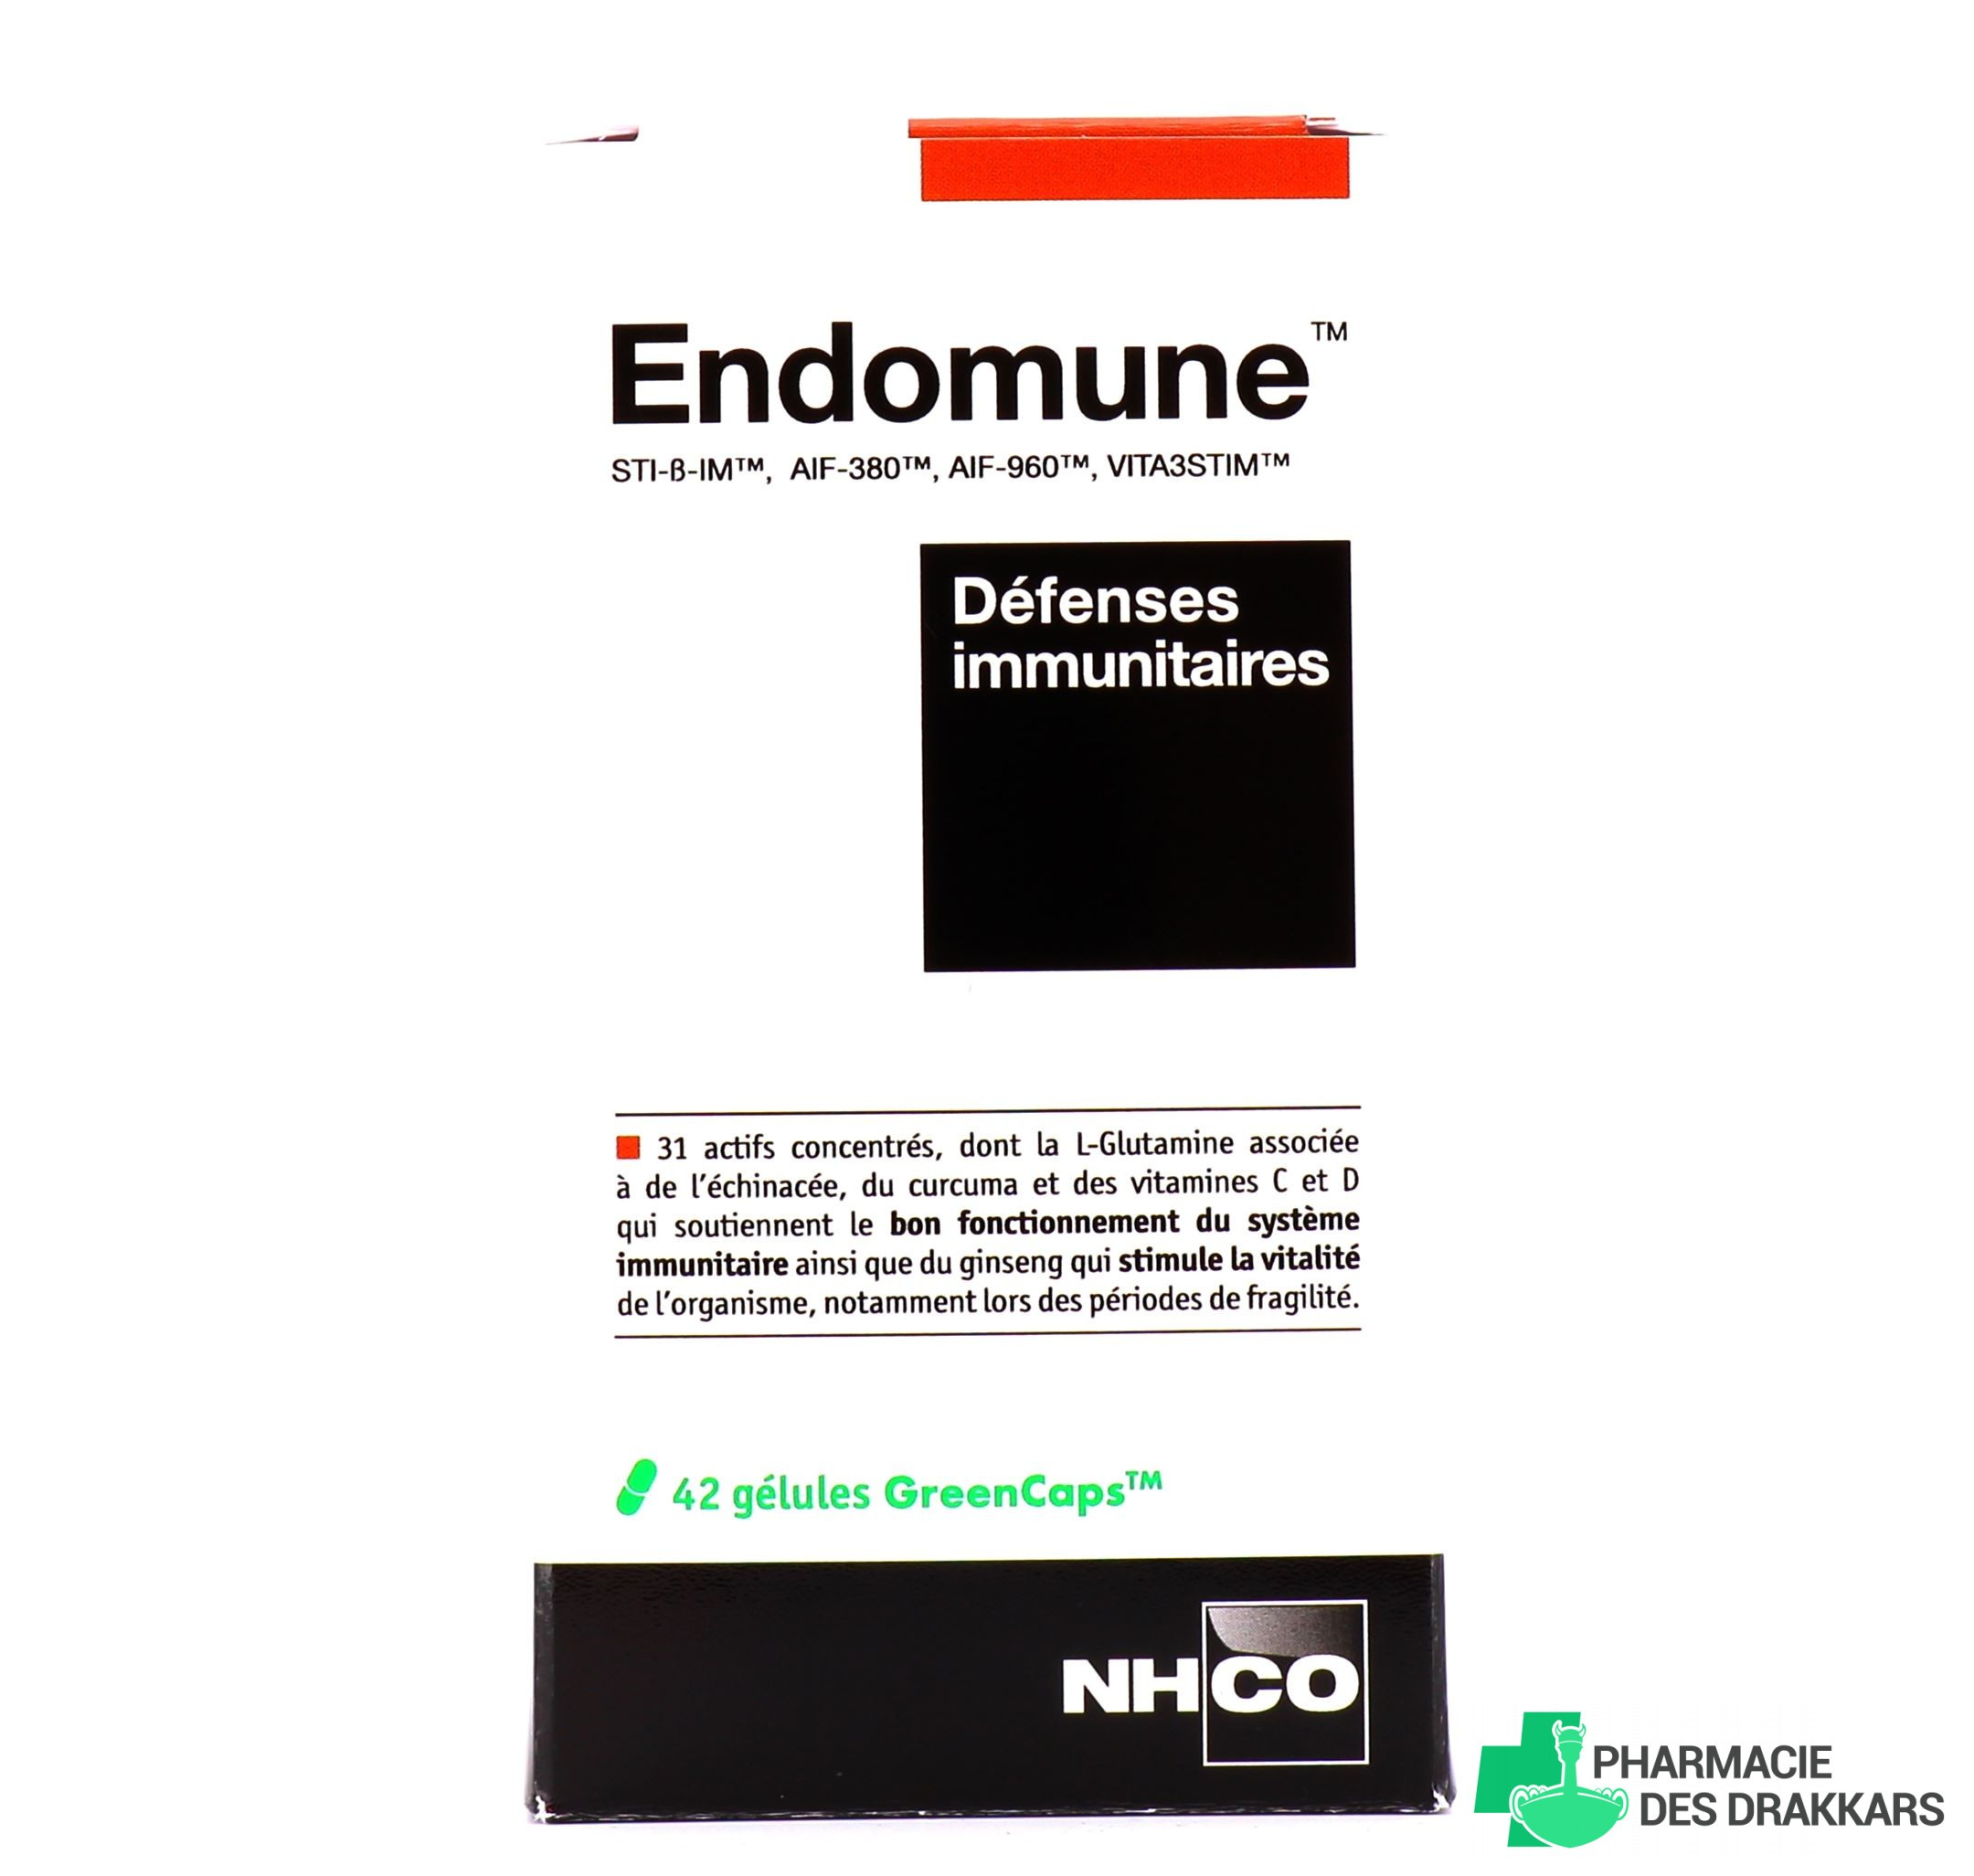 Endomune Défenses immunitaires NHCO - NHCO | Pharmacie des ...